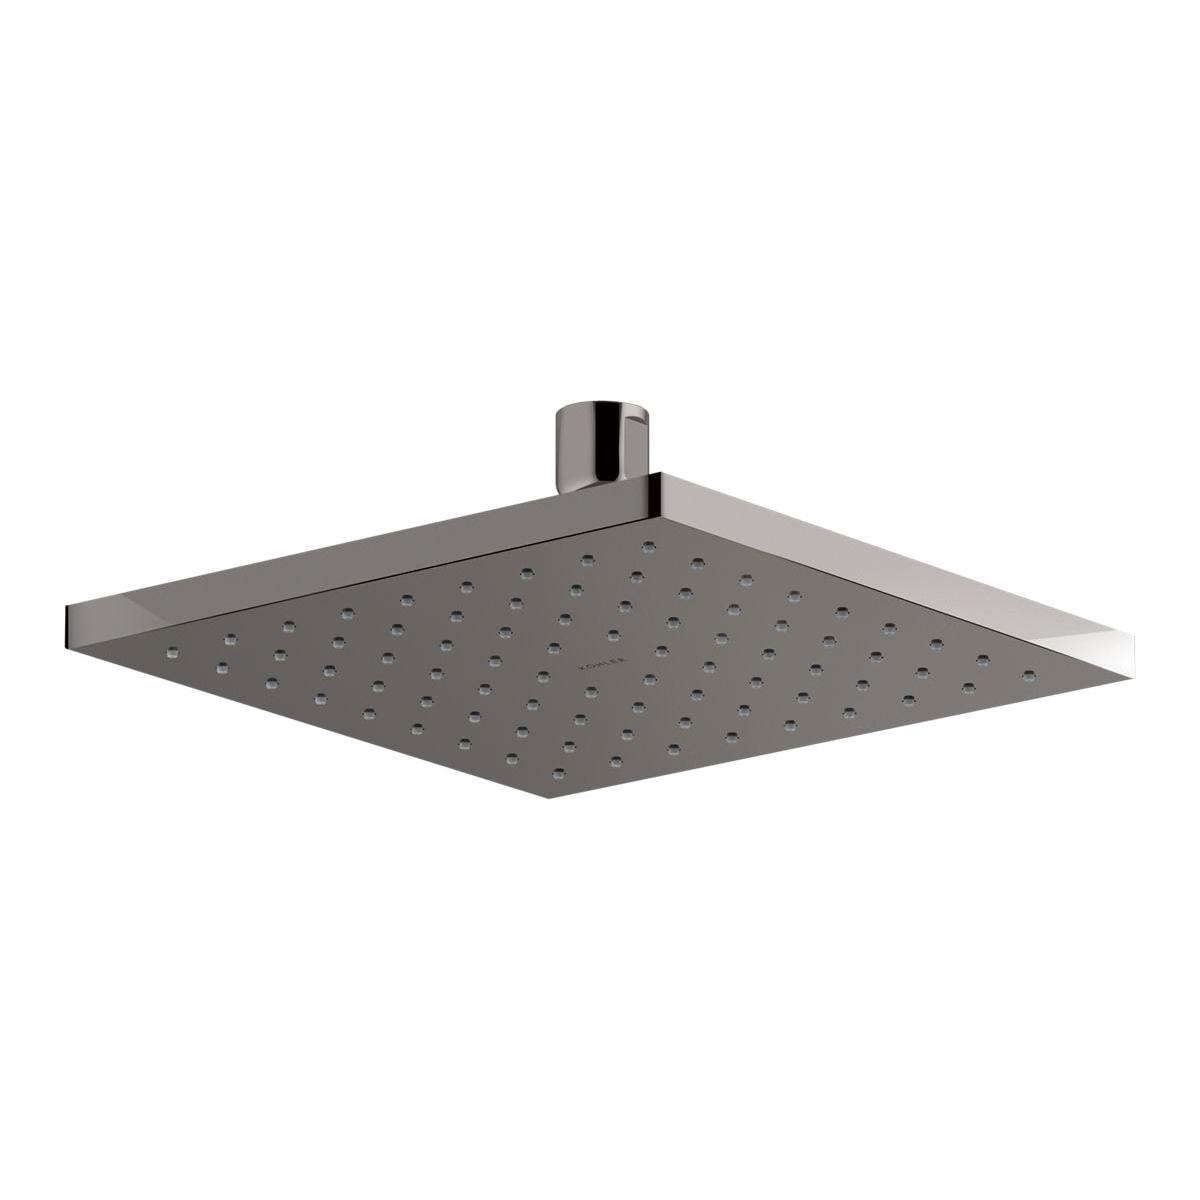 Kohler K 13695 G Tt Vibrant Titanium Contemporary Square